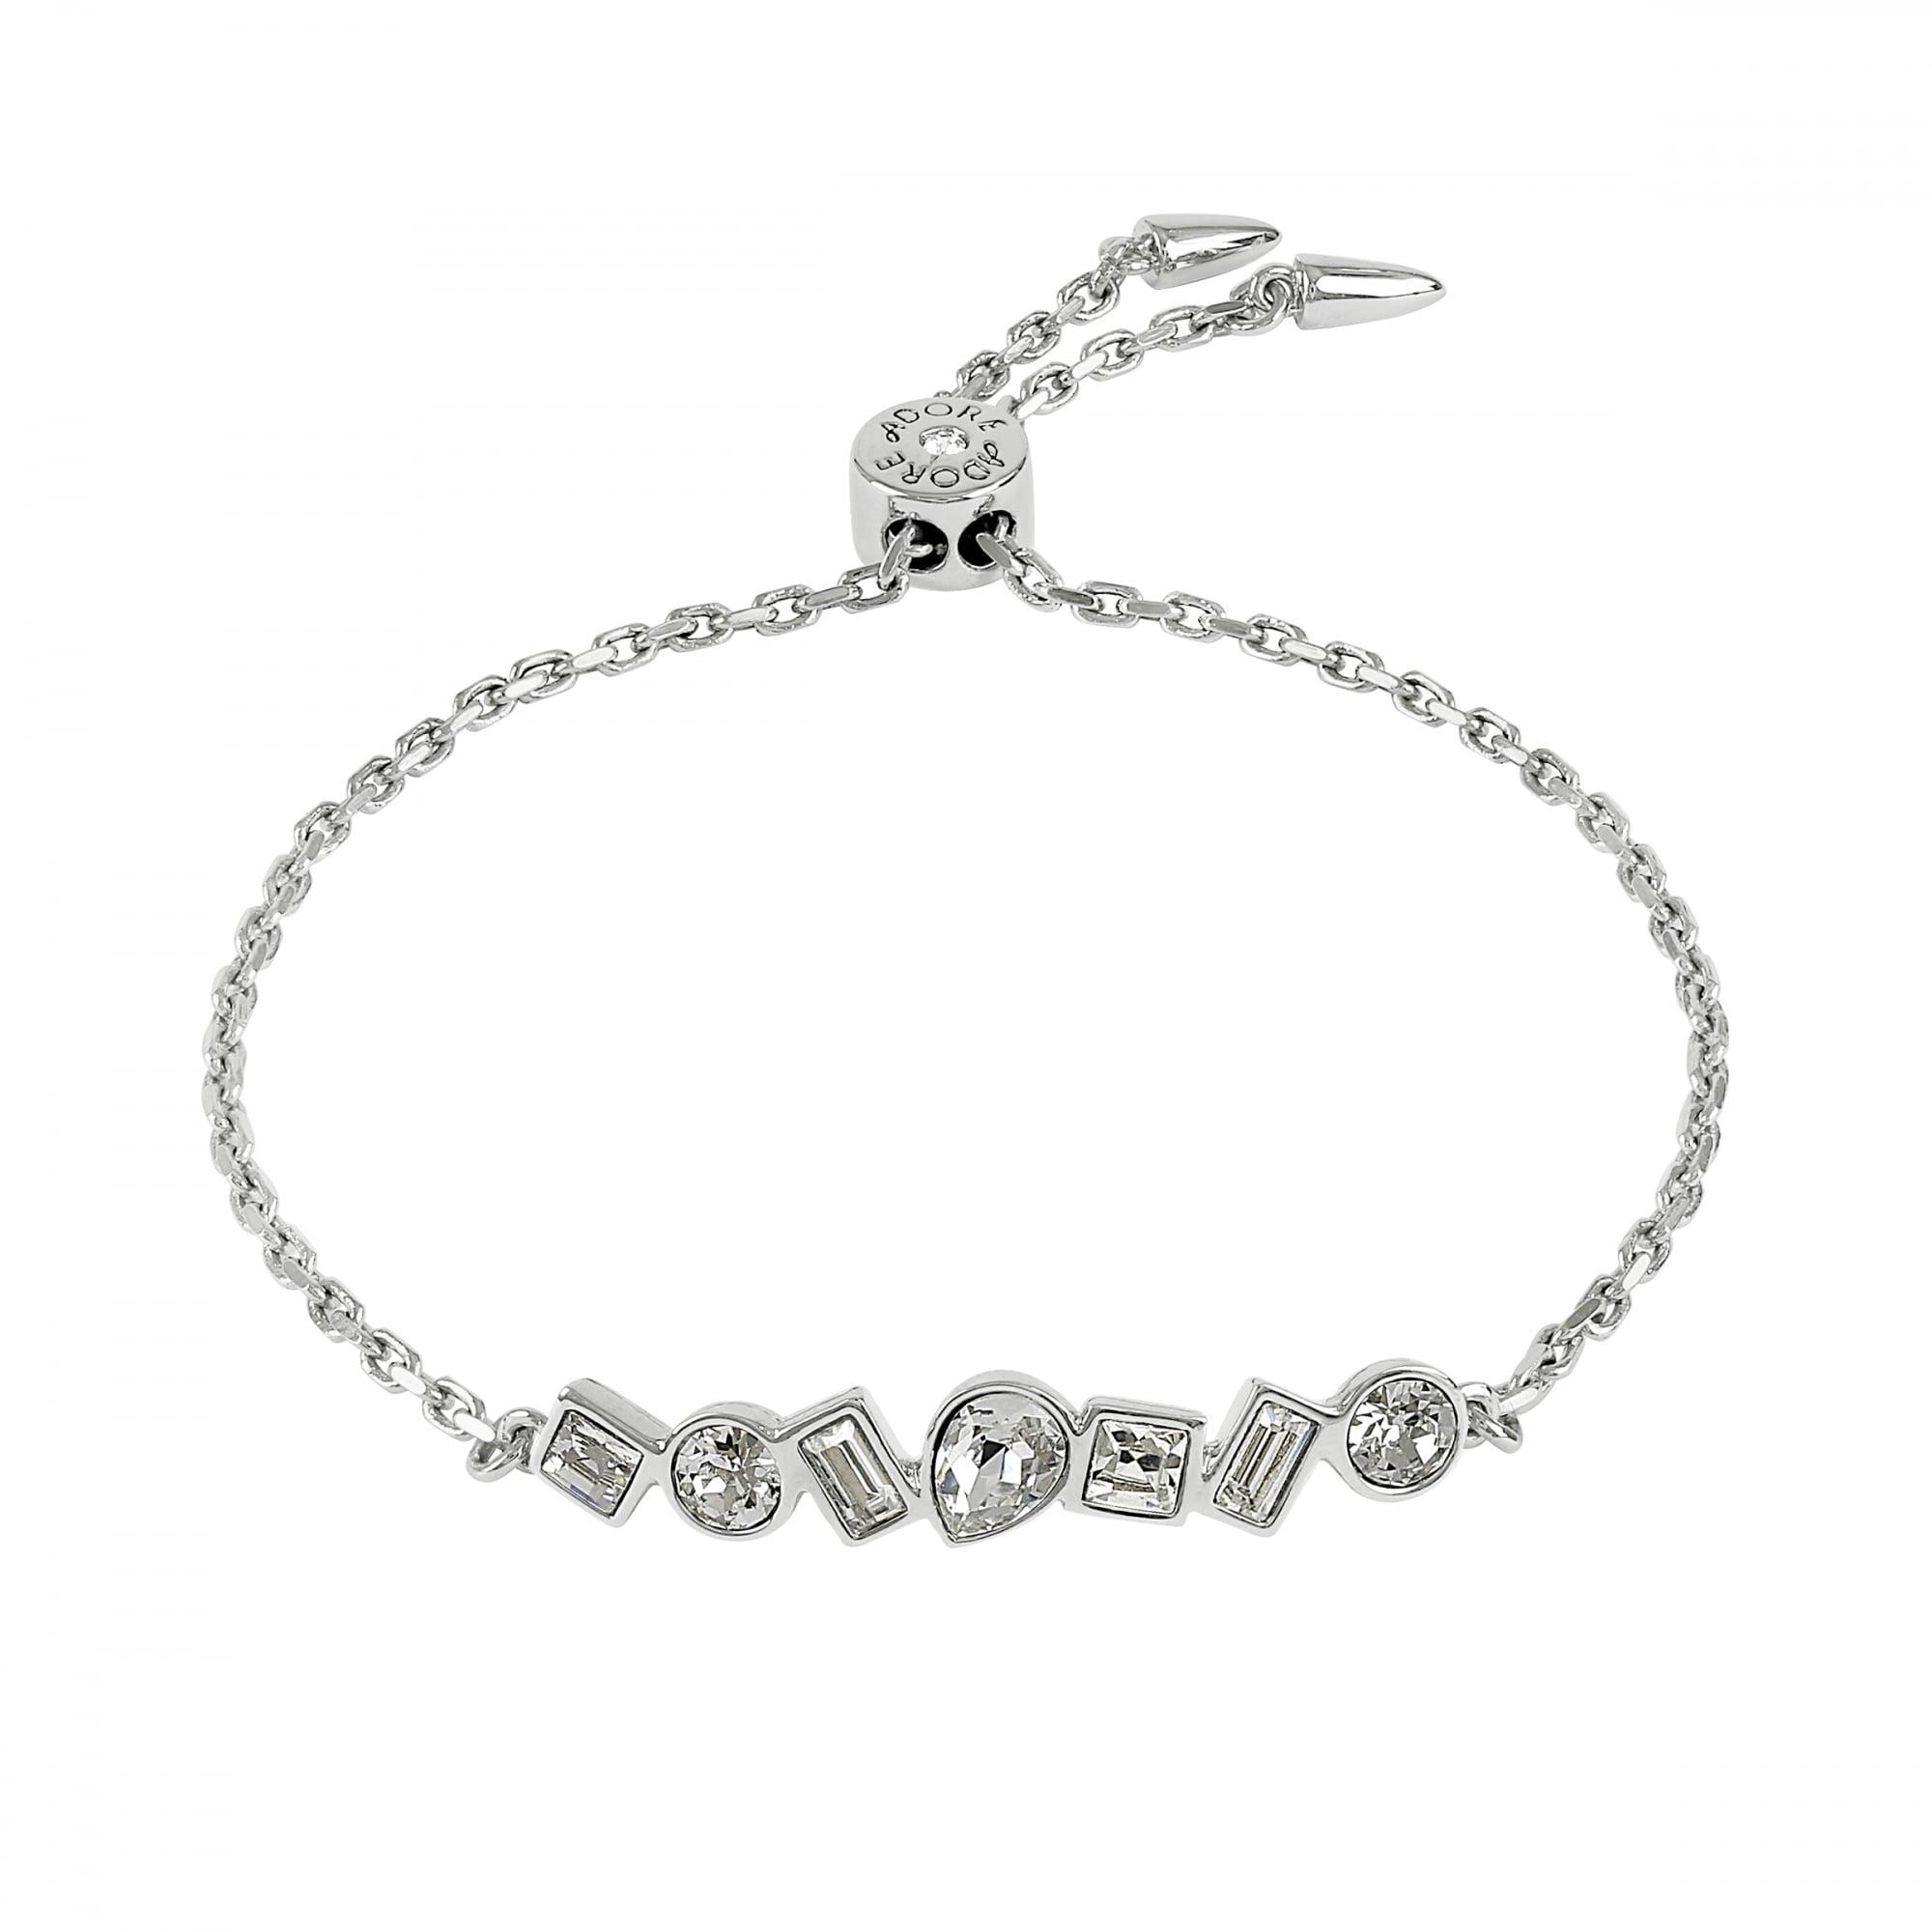 3df379fc8b61 Adore Silver Multi Shape Toggle Bracelet Created With Swarovski® Crystals